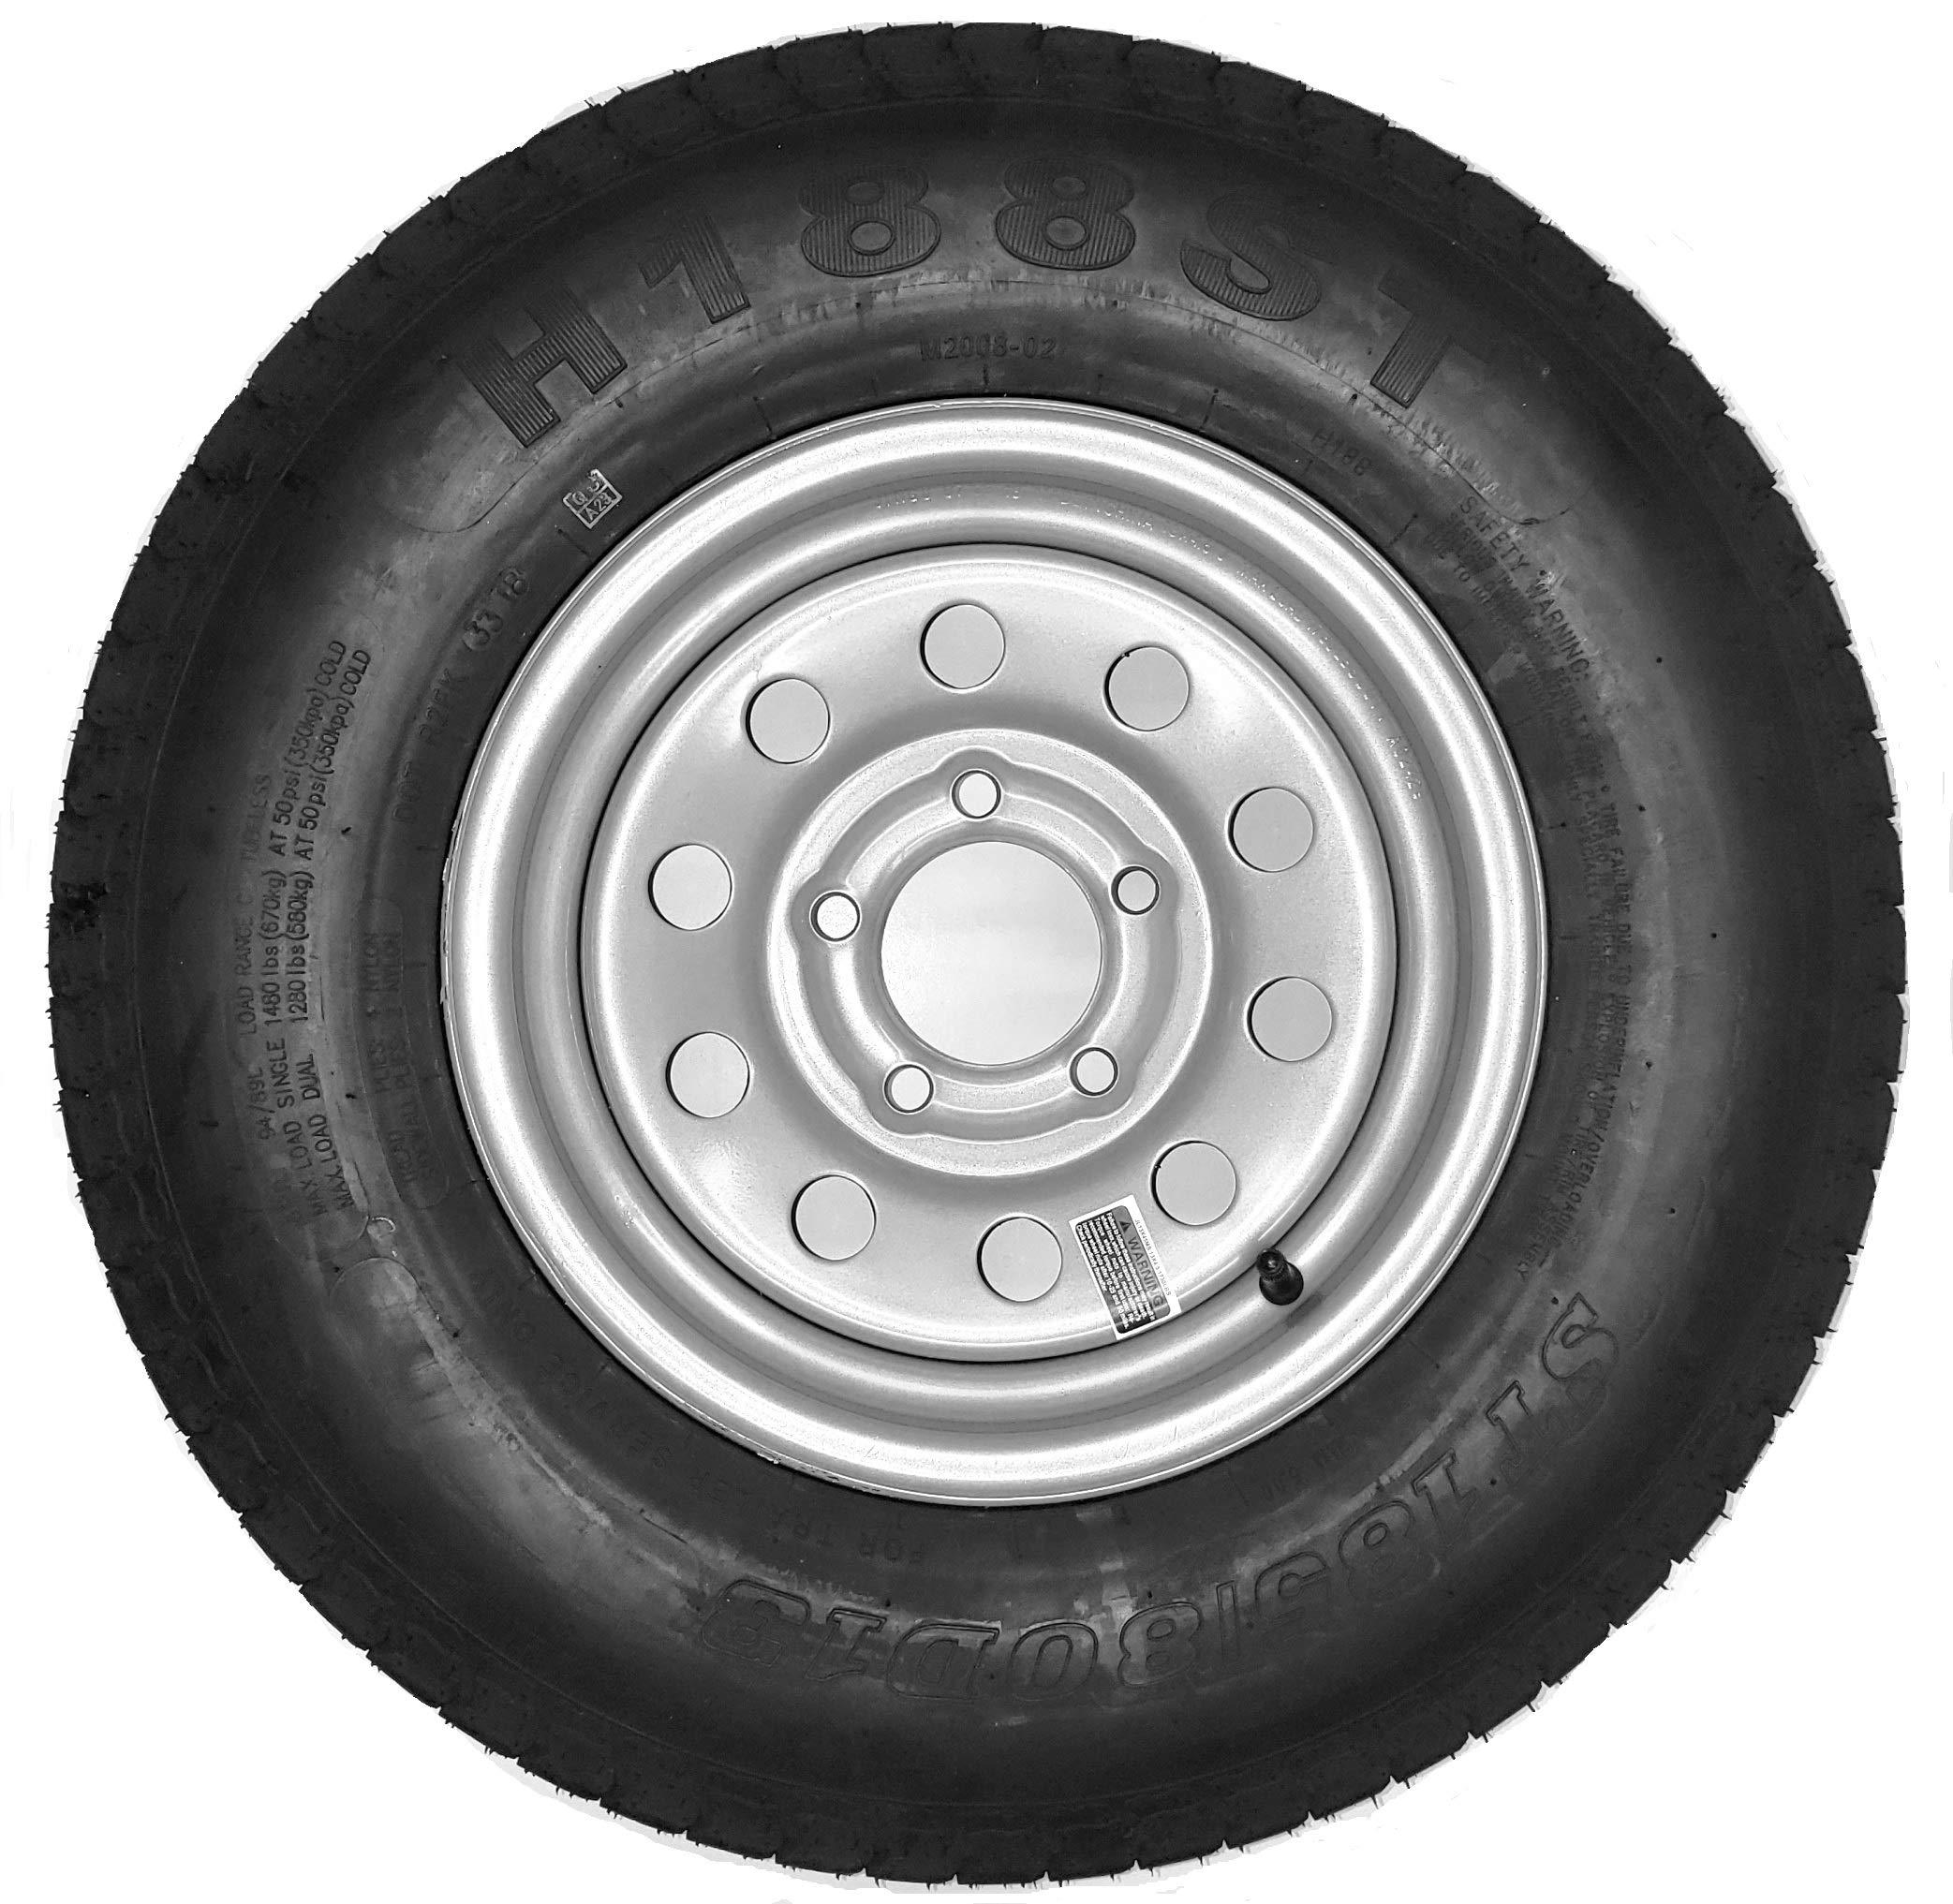 Amazon.com: Trailer Tire + Rim ST185/80D13 185/80D-13 13 ST Silver Modular Boat Camper RV: Automotive